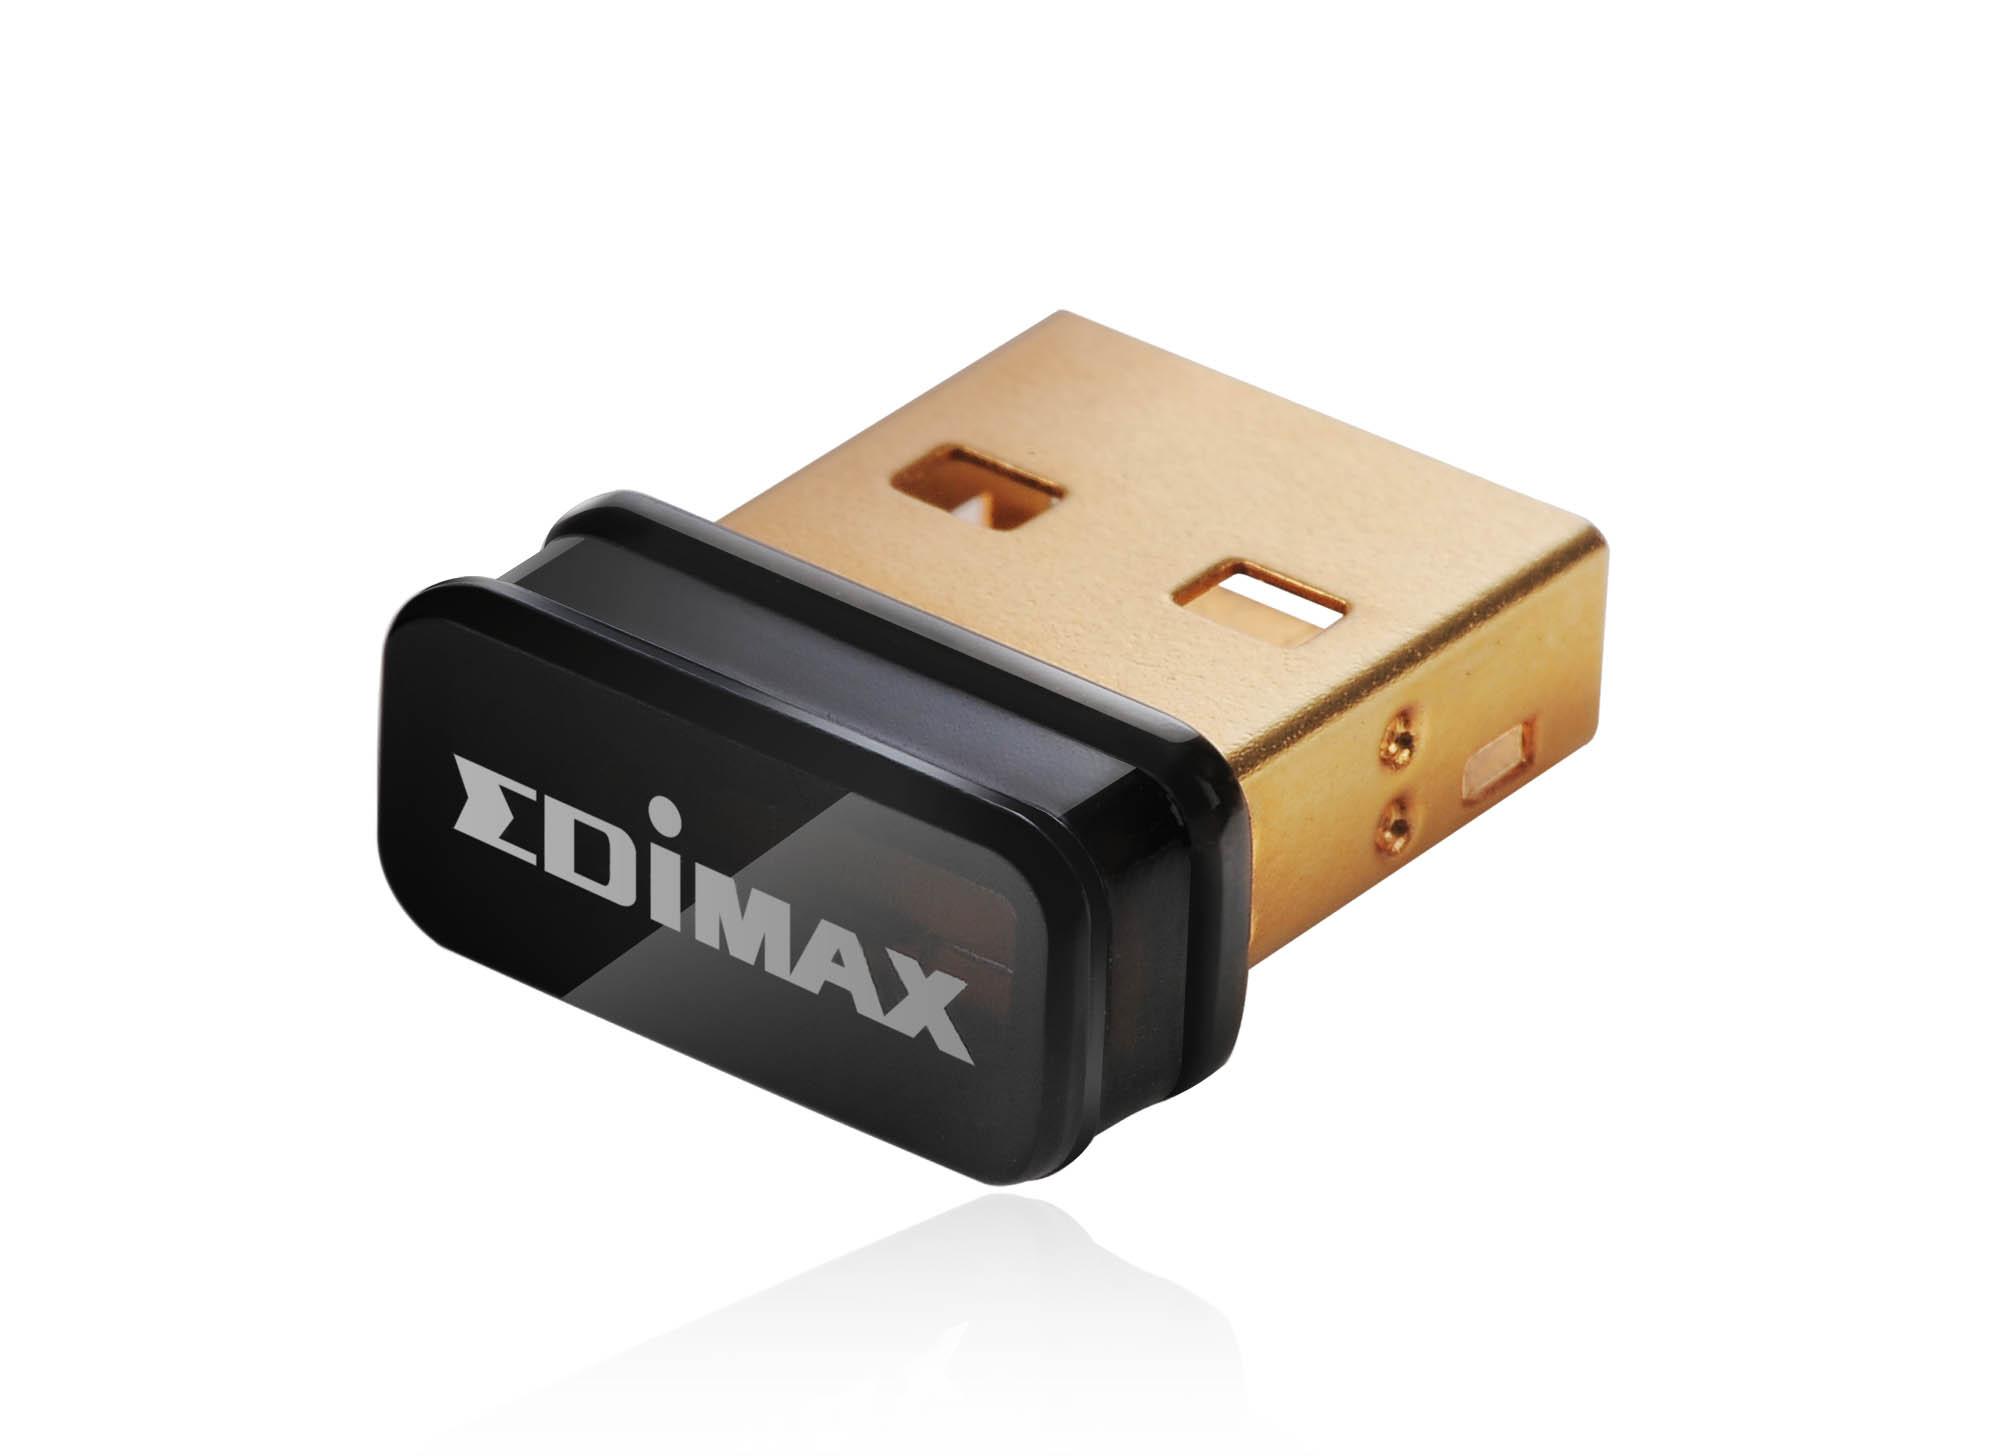 Edimax EW-7811Un WLAN 150Mbit/s networking card